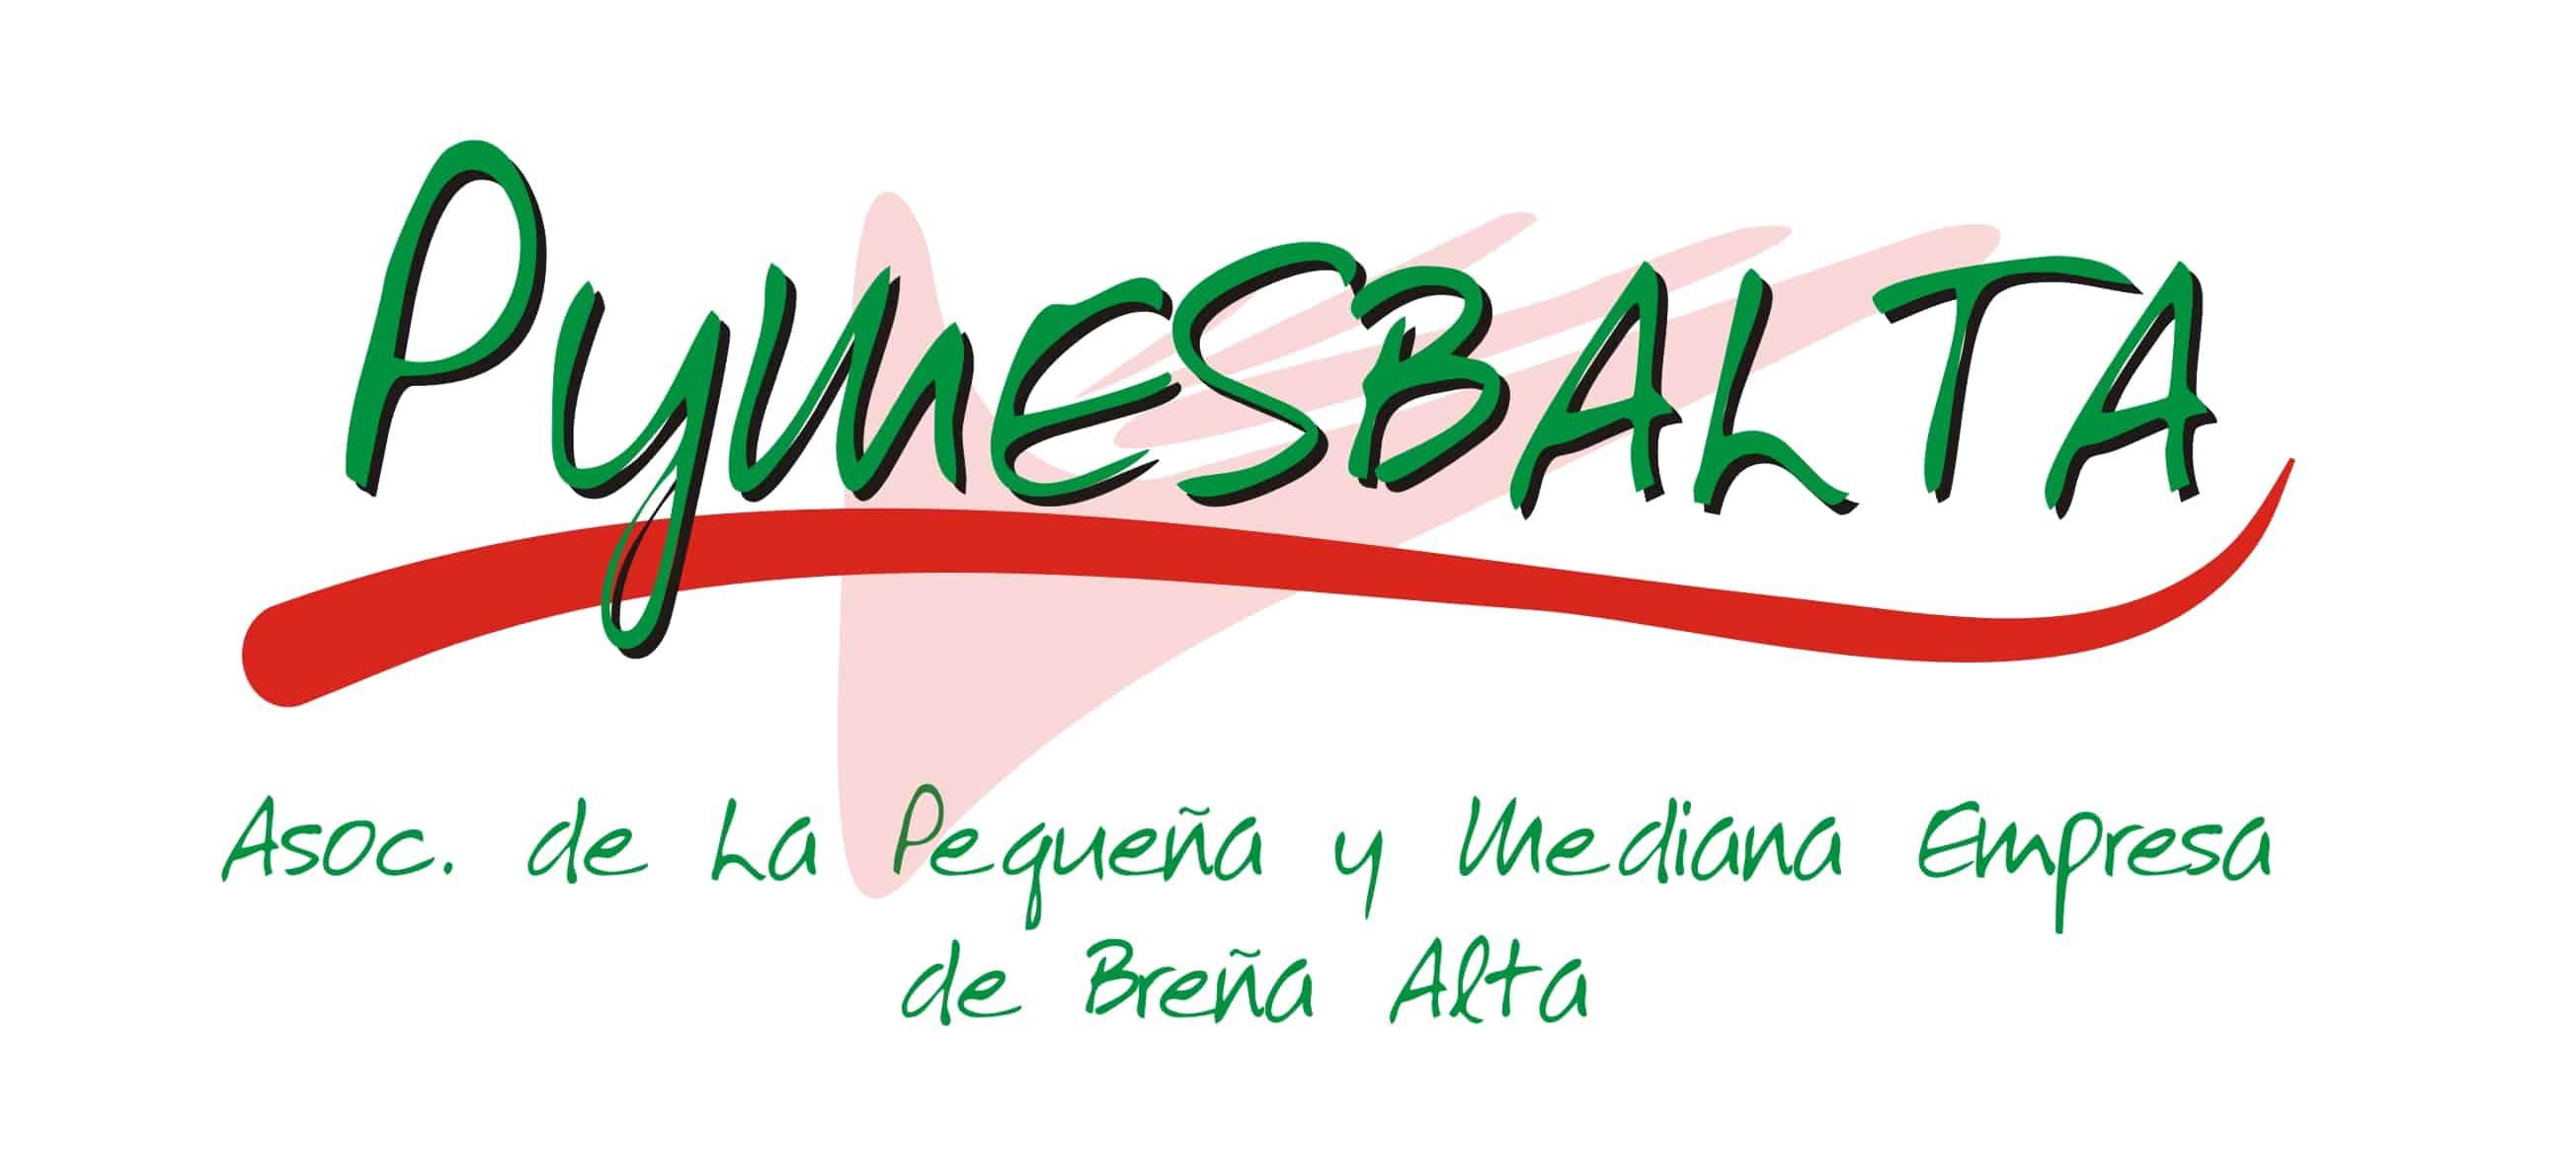 Logo PYMESBALTA